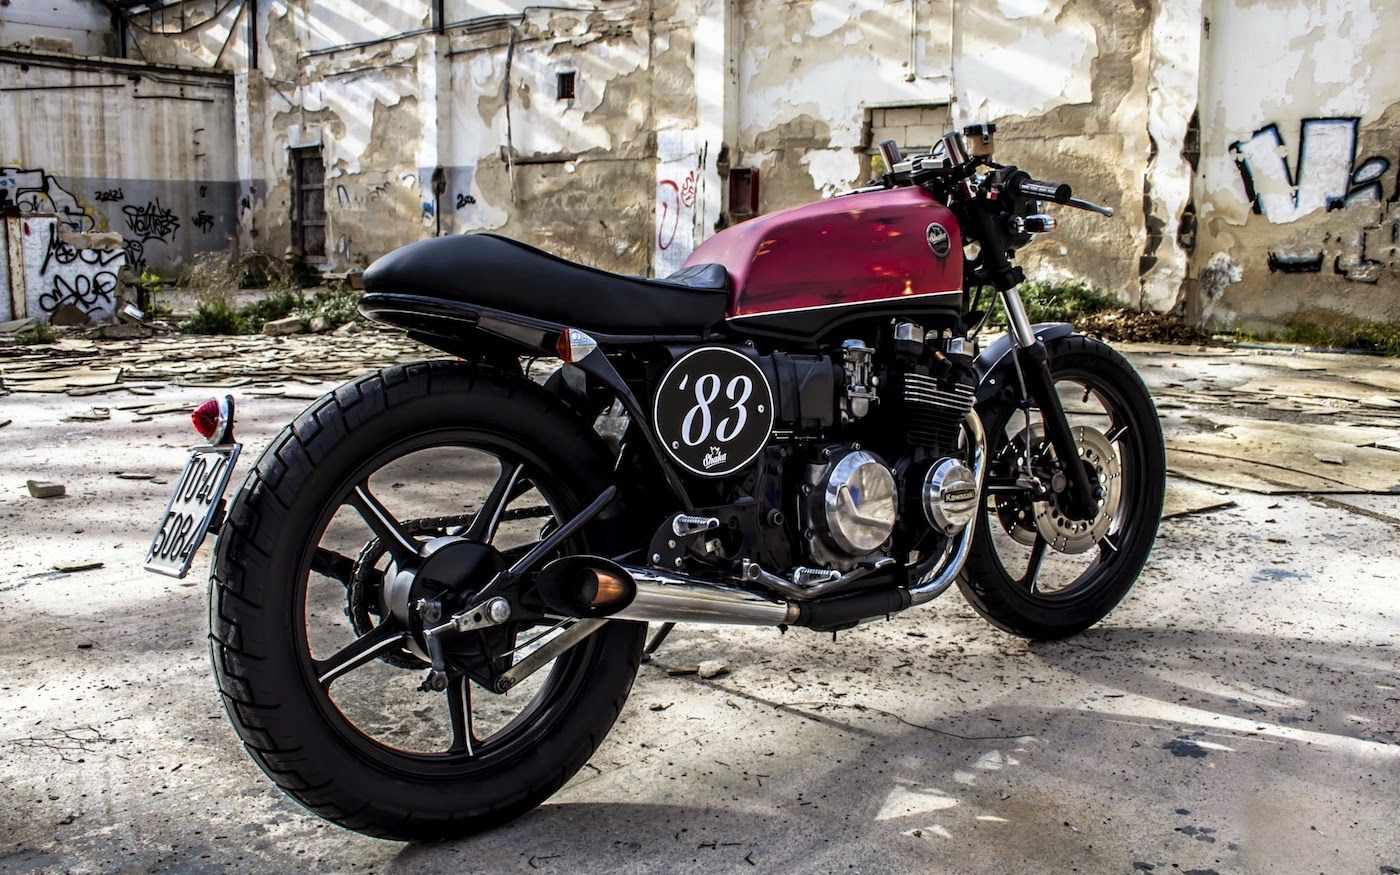 Kawasaki Gpz 550 Cafe Racer Motorcycle Dreams Custom